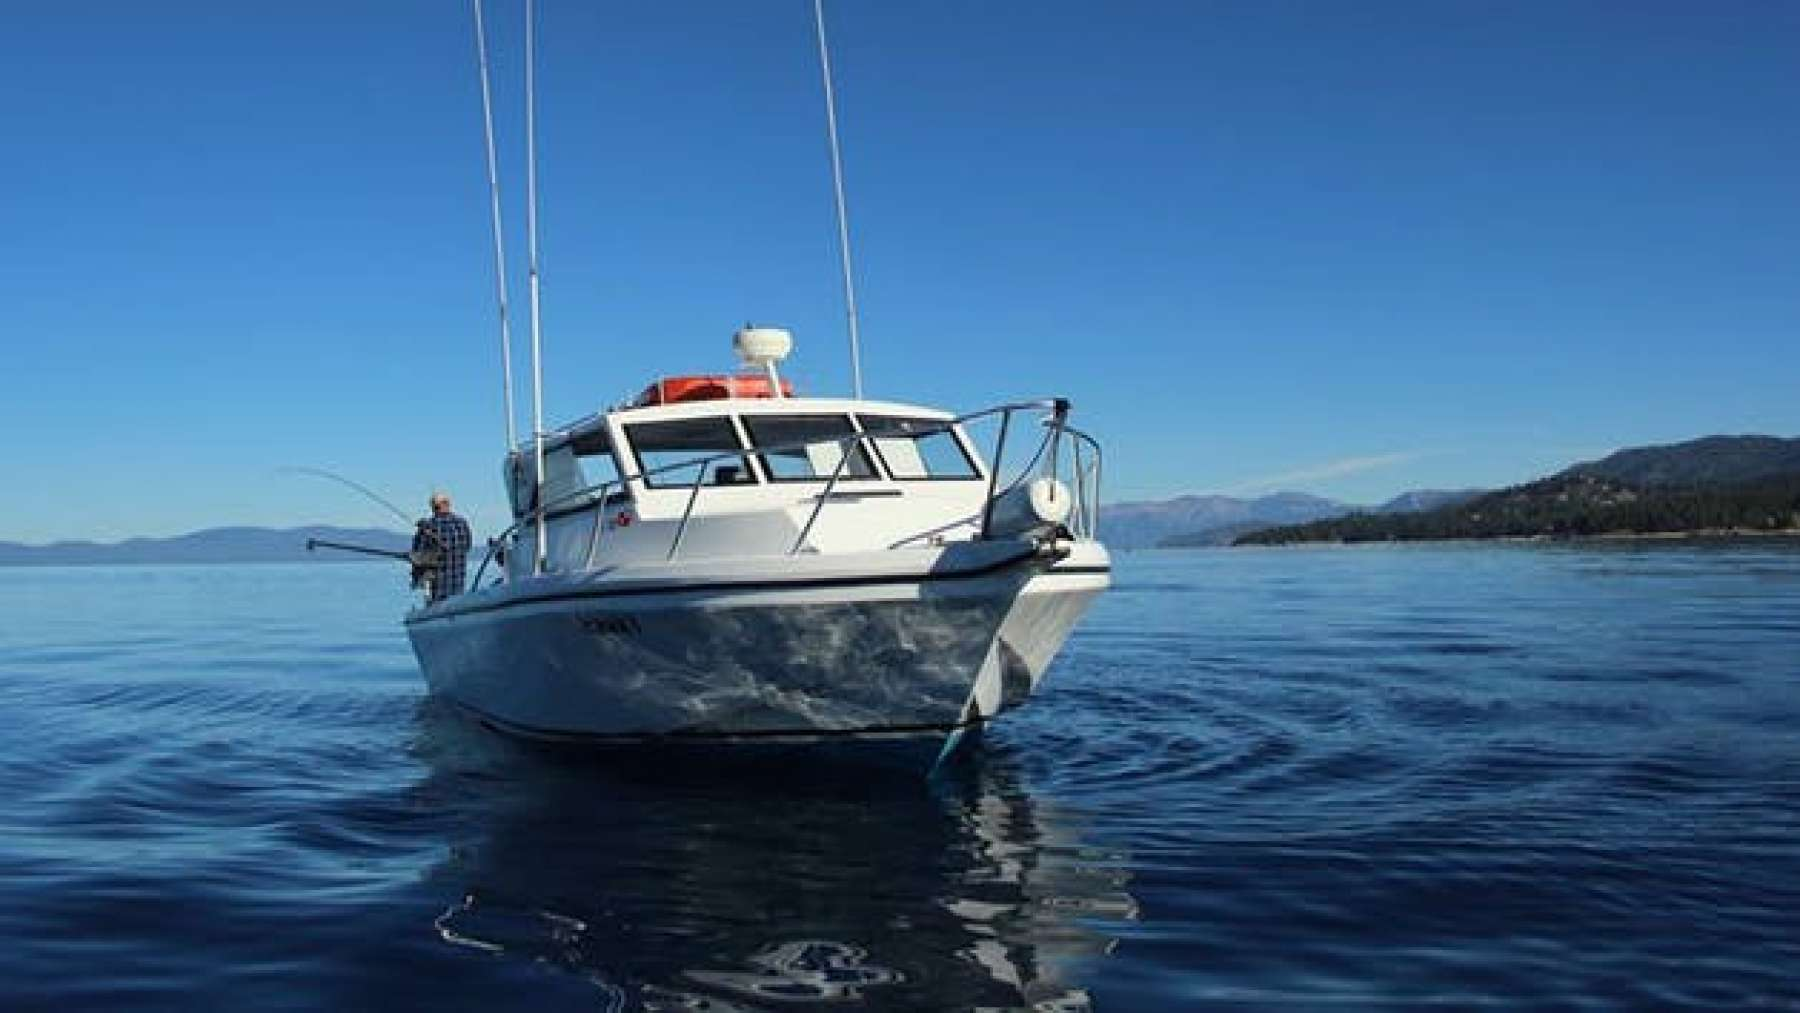 Zephyer Cove Sport Fishing